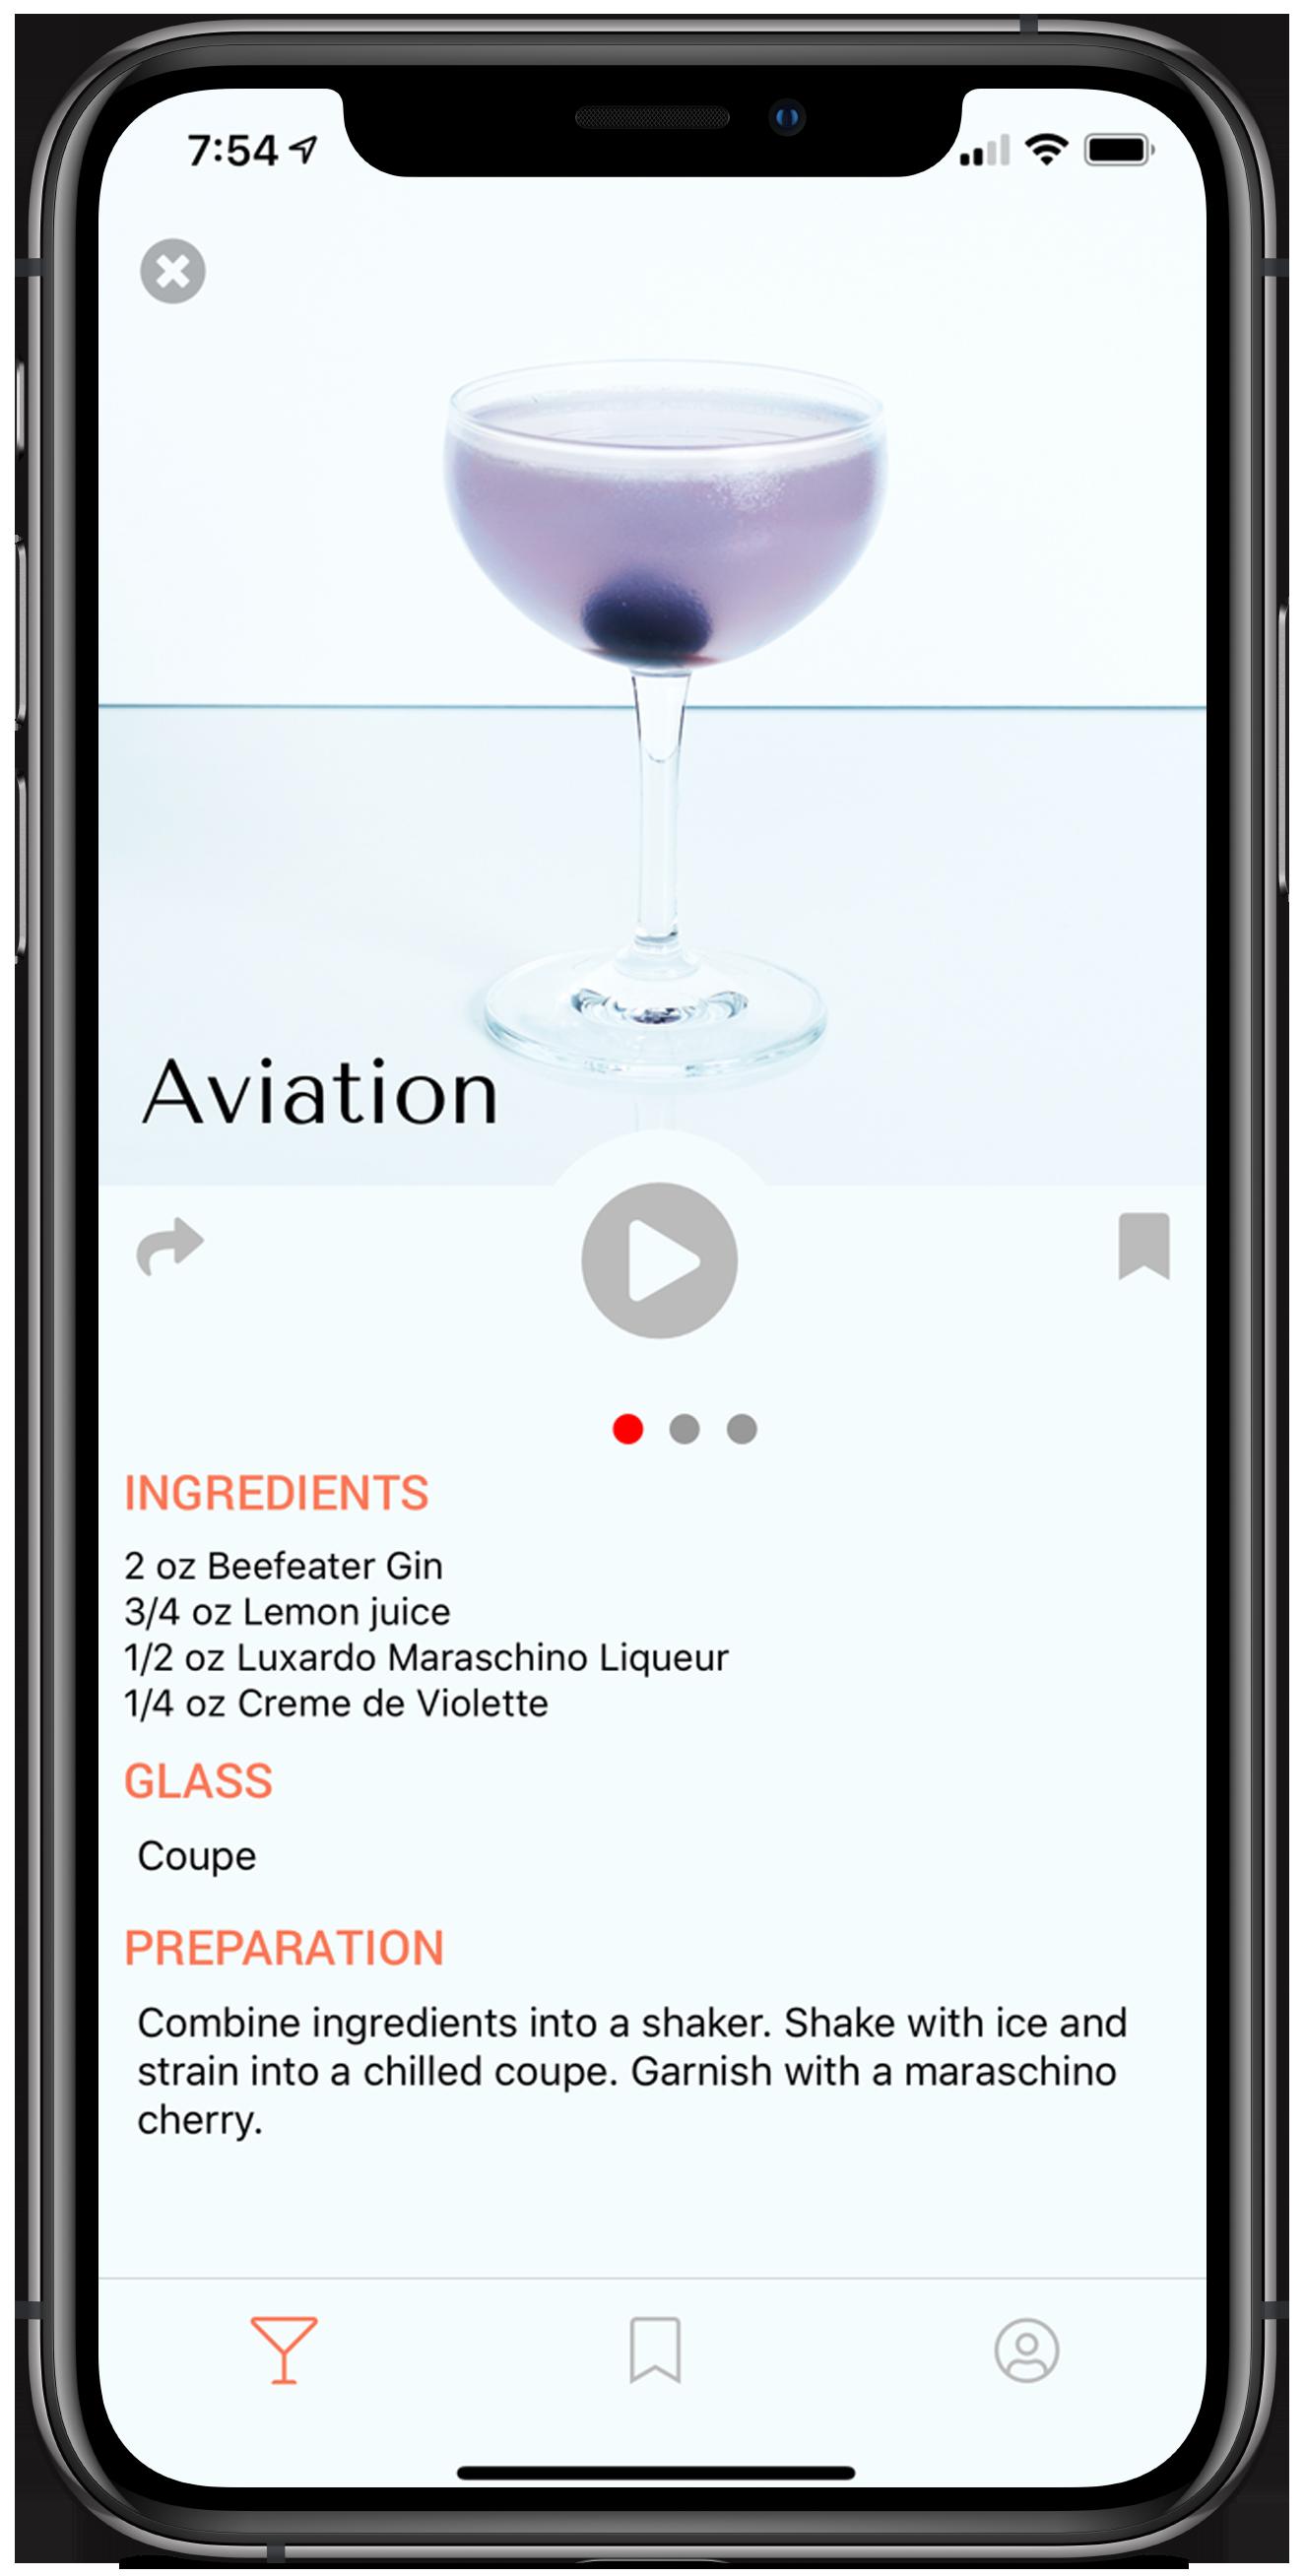 iPhoneX_Aviation.png